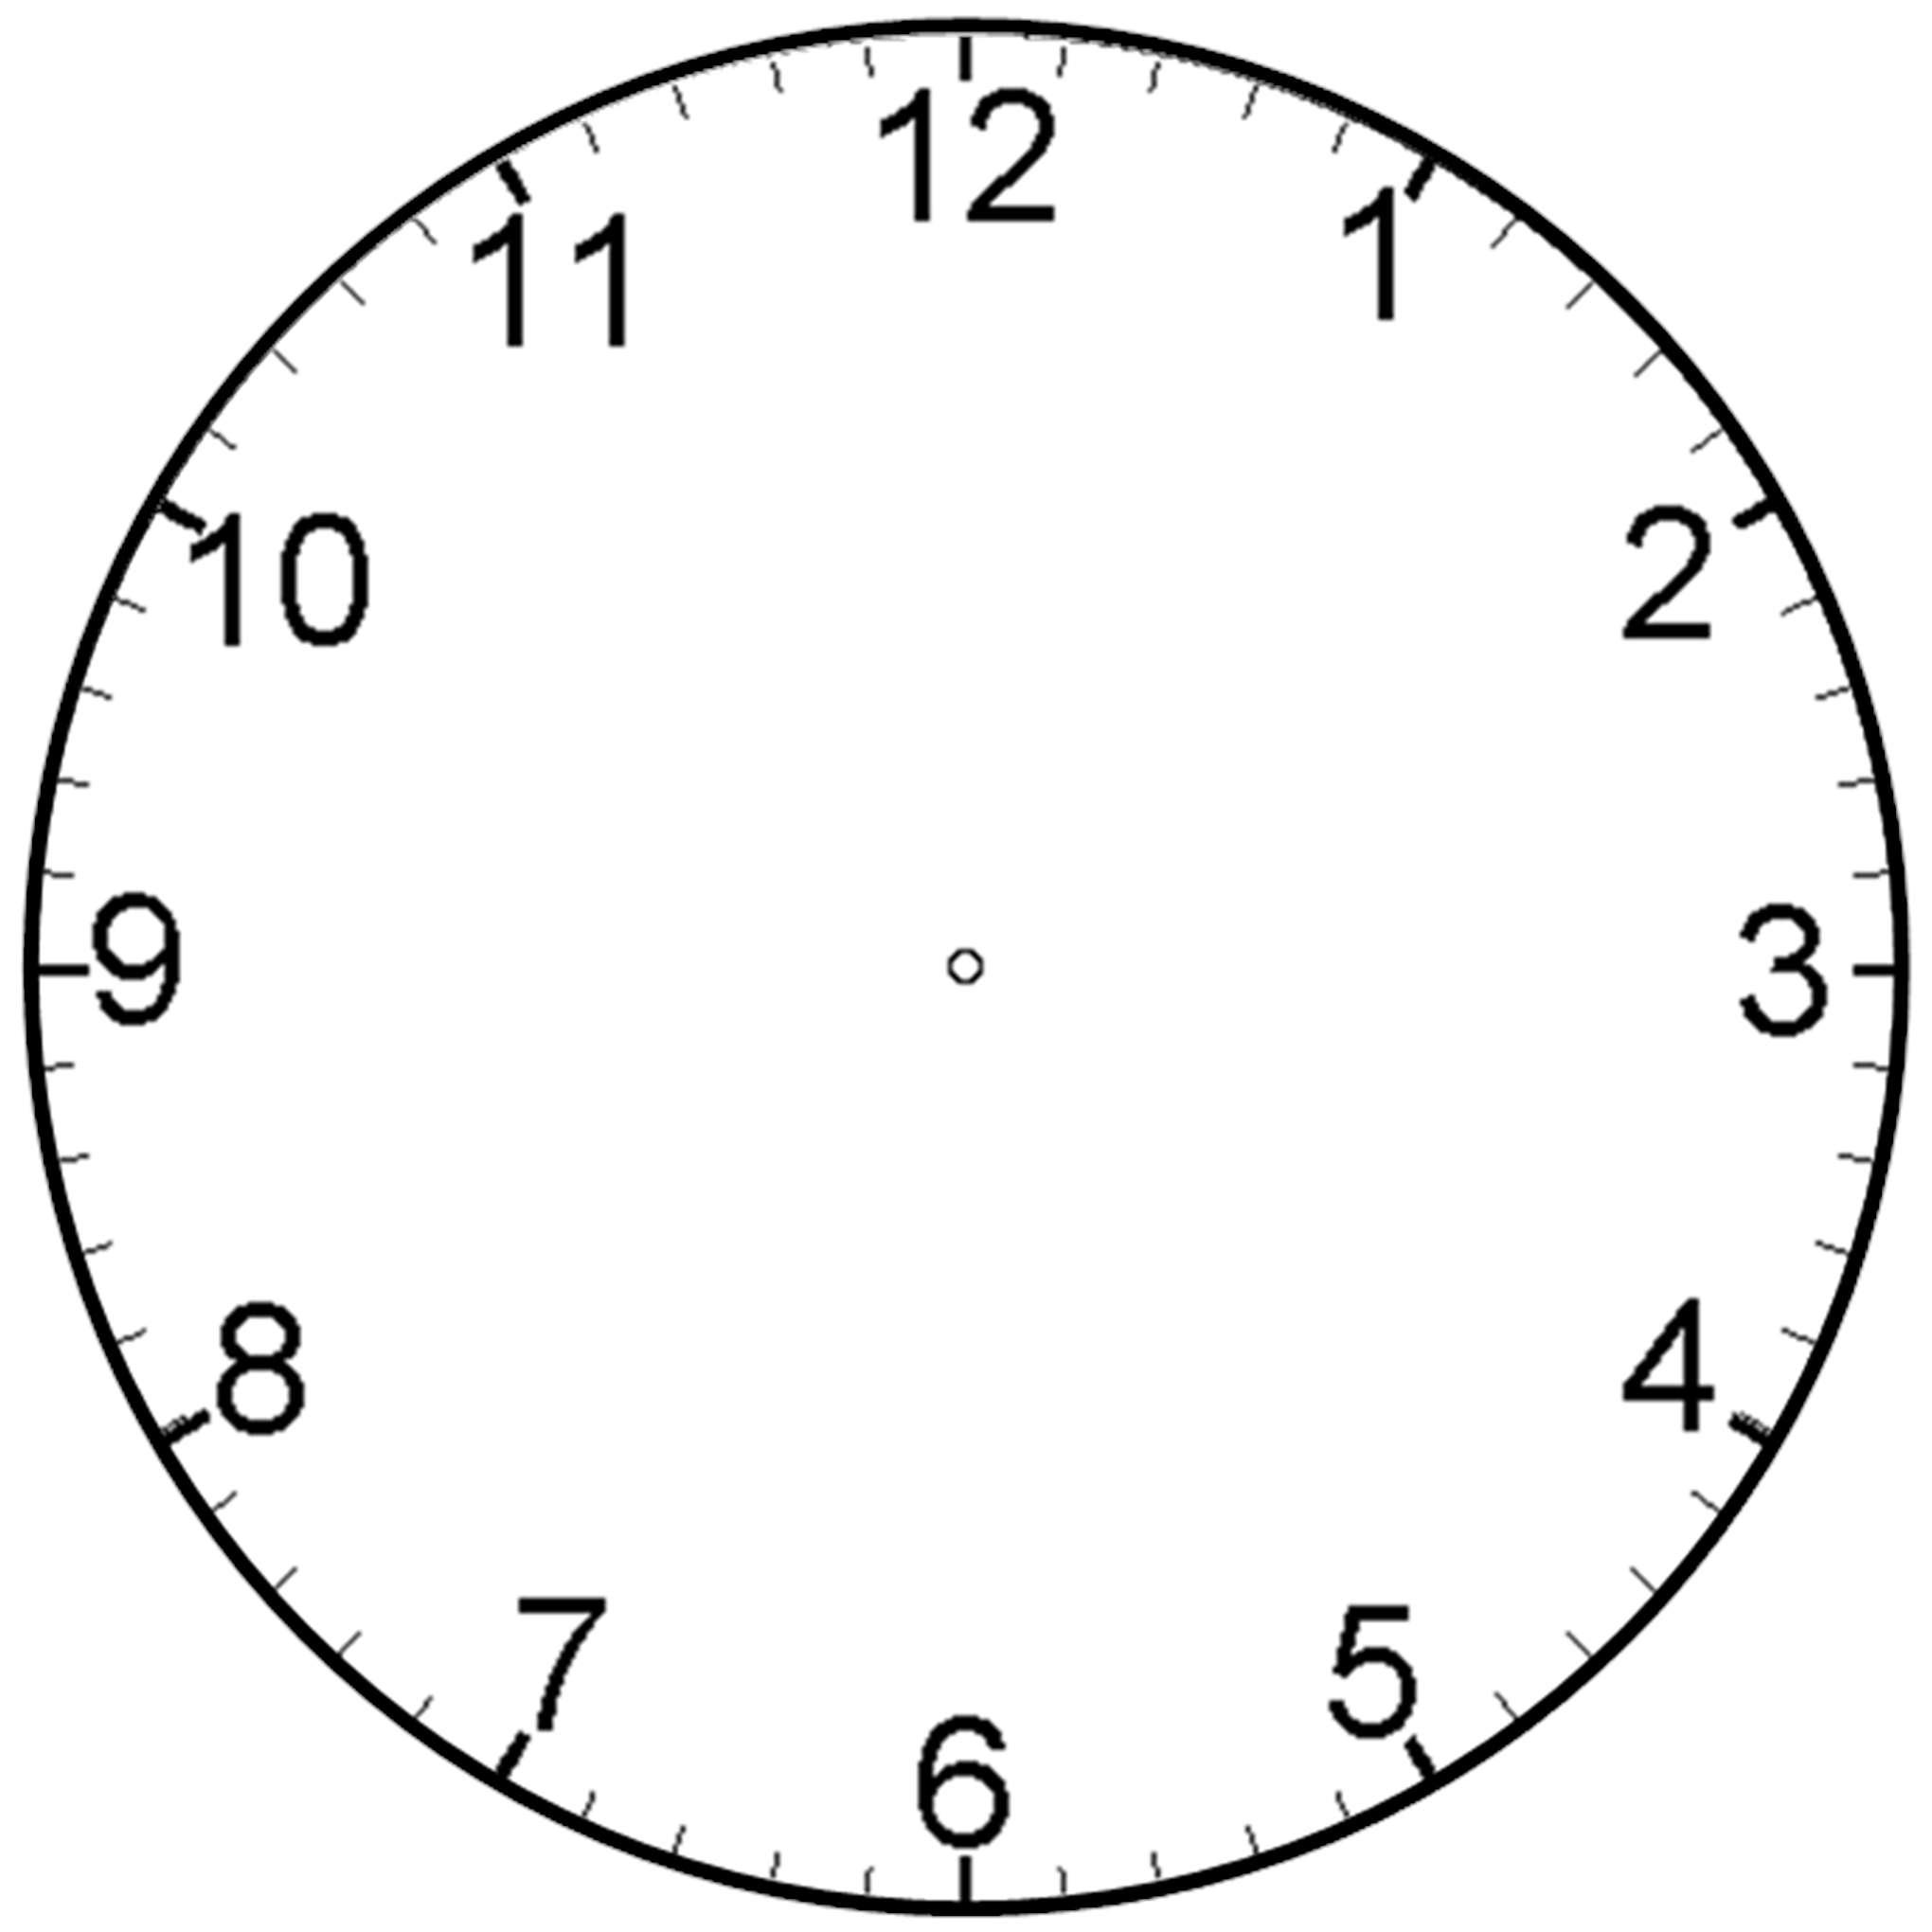 Free Clock Templates, Download Free Clock Templates png